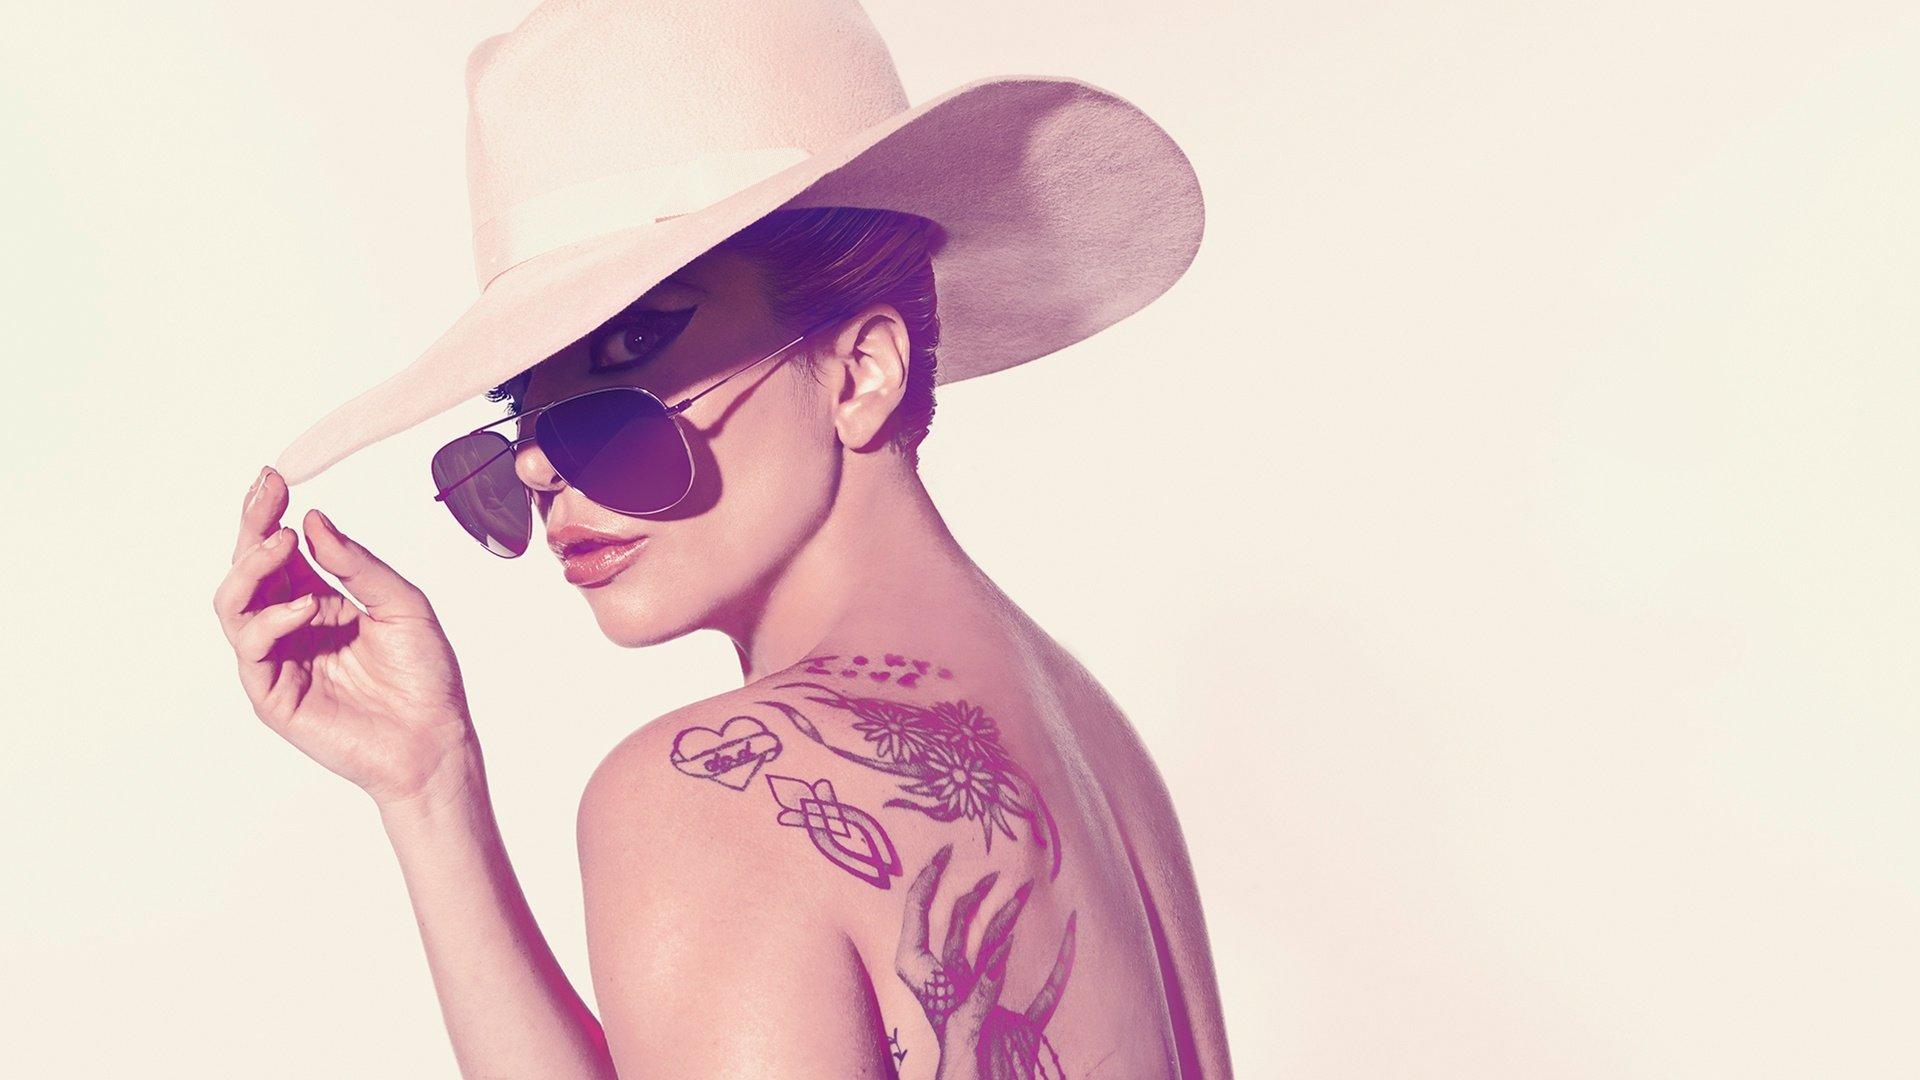 Music - Lady Gaga  Singer American Tattoo Sunglasses Hat Wallpaper